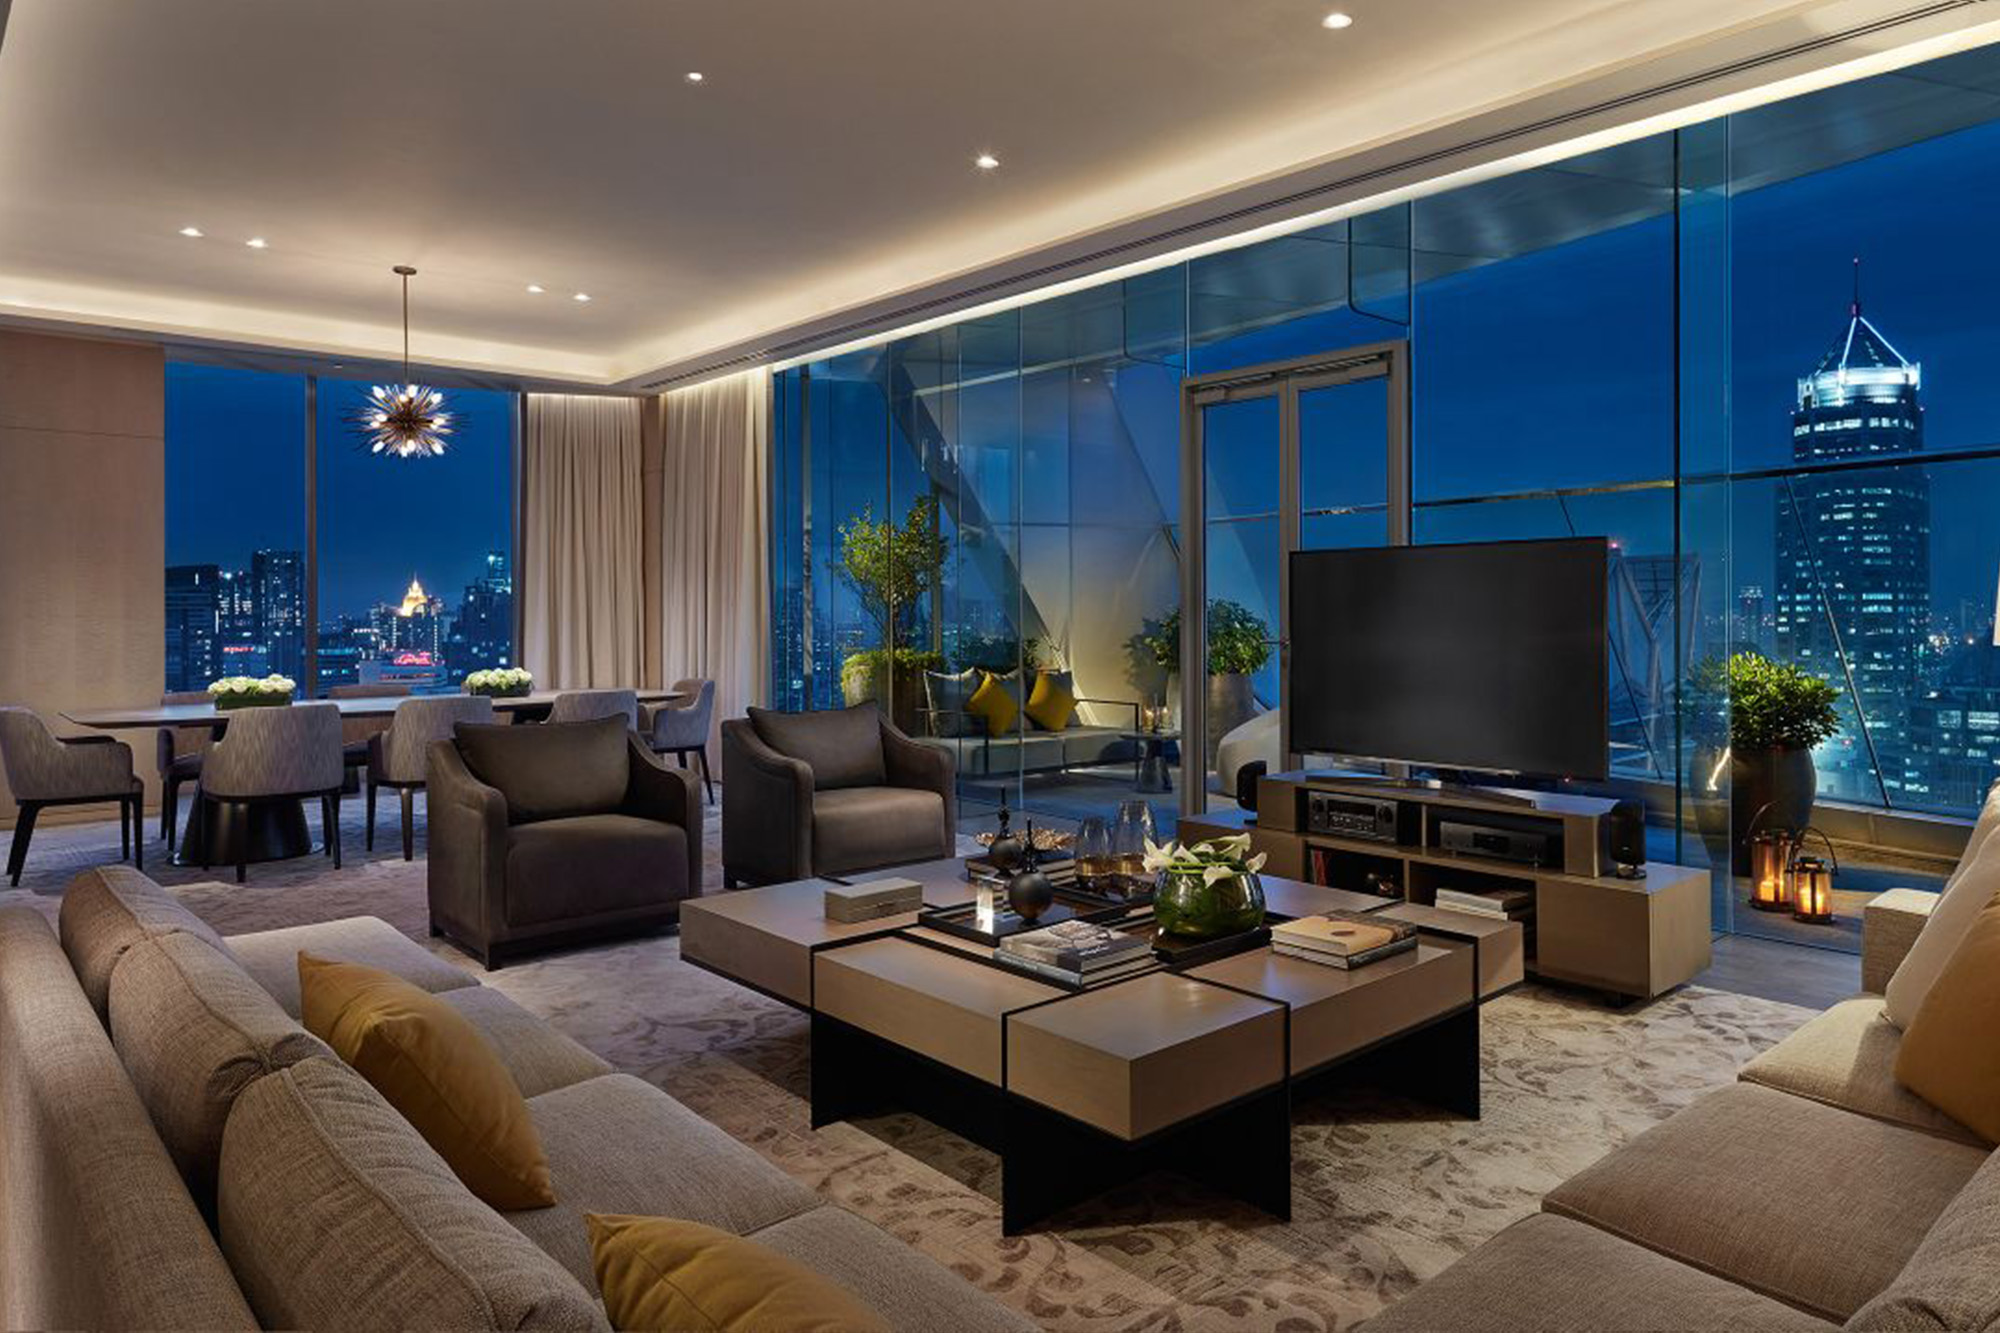 曼谷 柏悅酒店 Park Hyatt Bangkok 曼谷 Park Hyatt 曼谷柏悅 Park Hyatt Bangkok 酒店